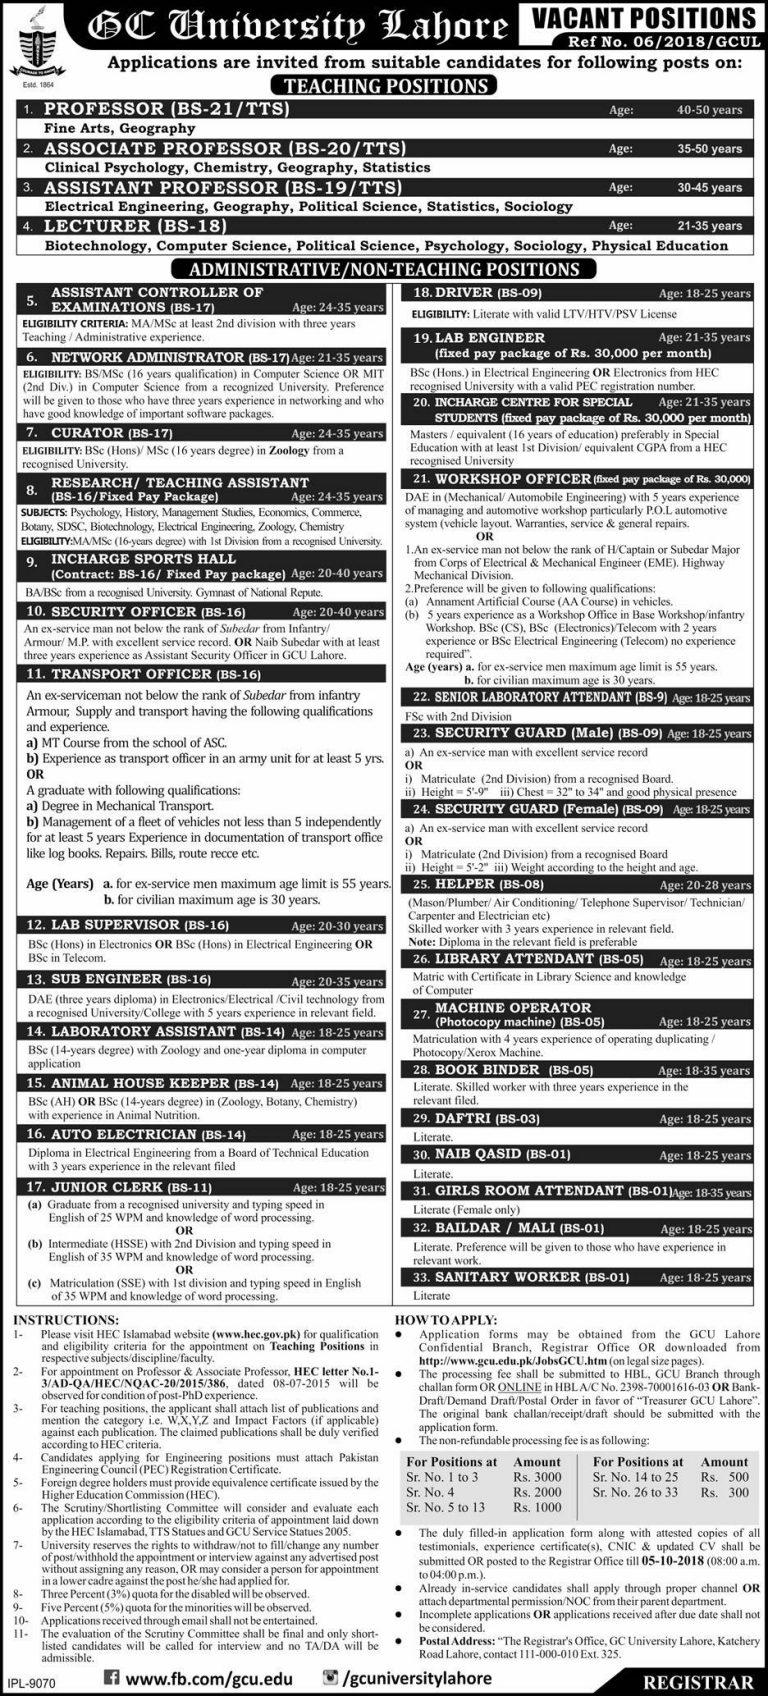 GC University Lahore Jobs 2018 Application Form Download Latest Vacancies